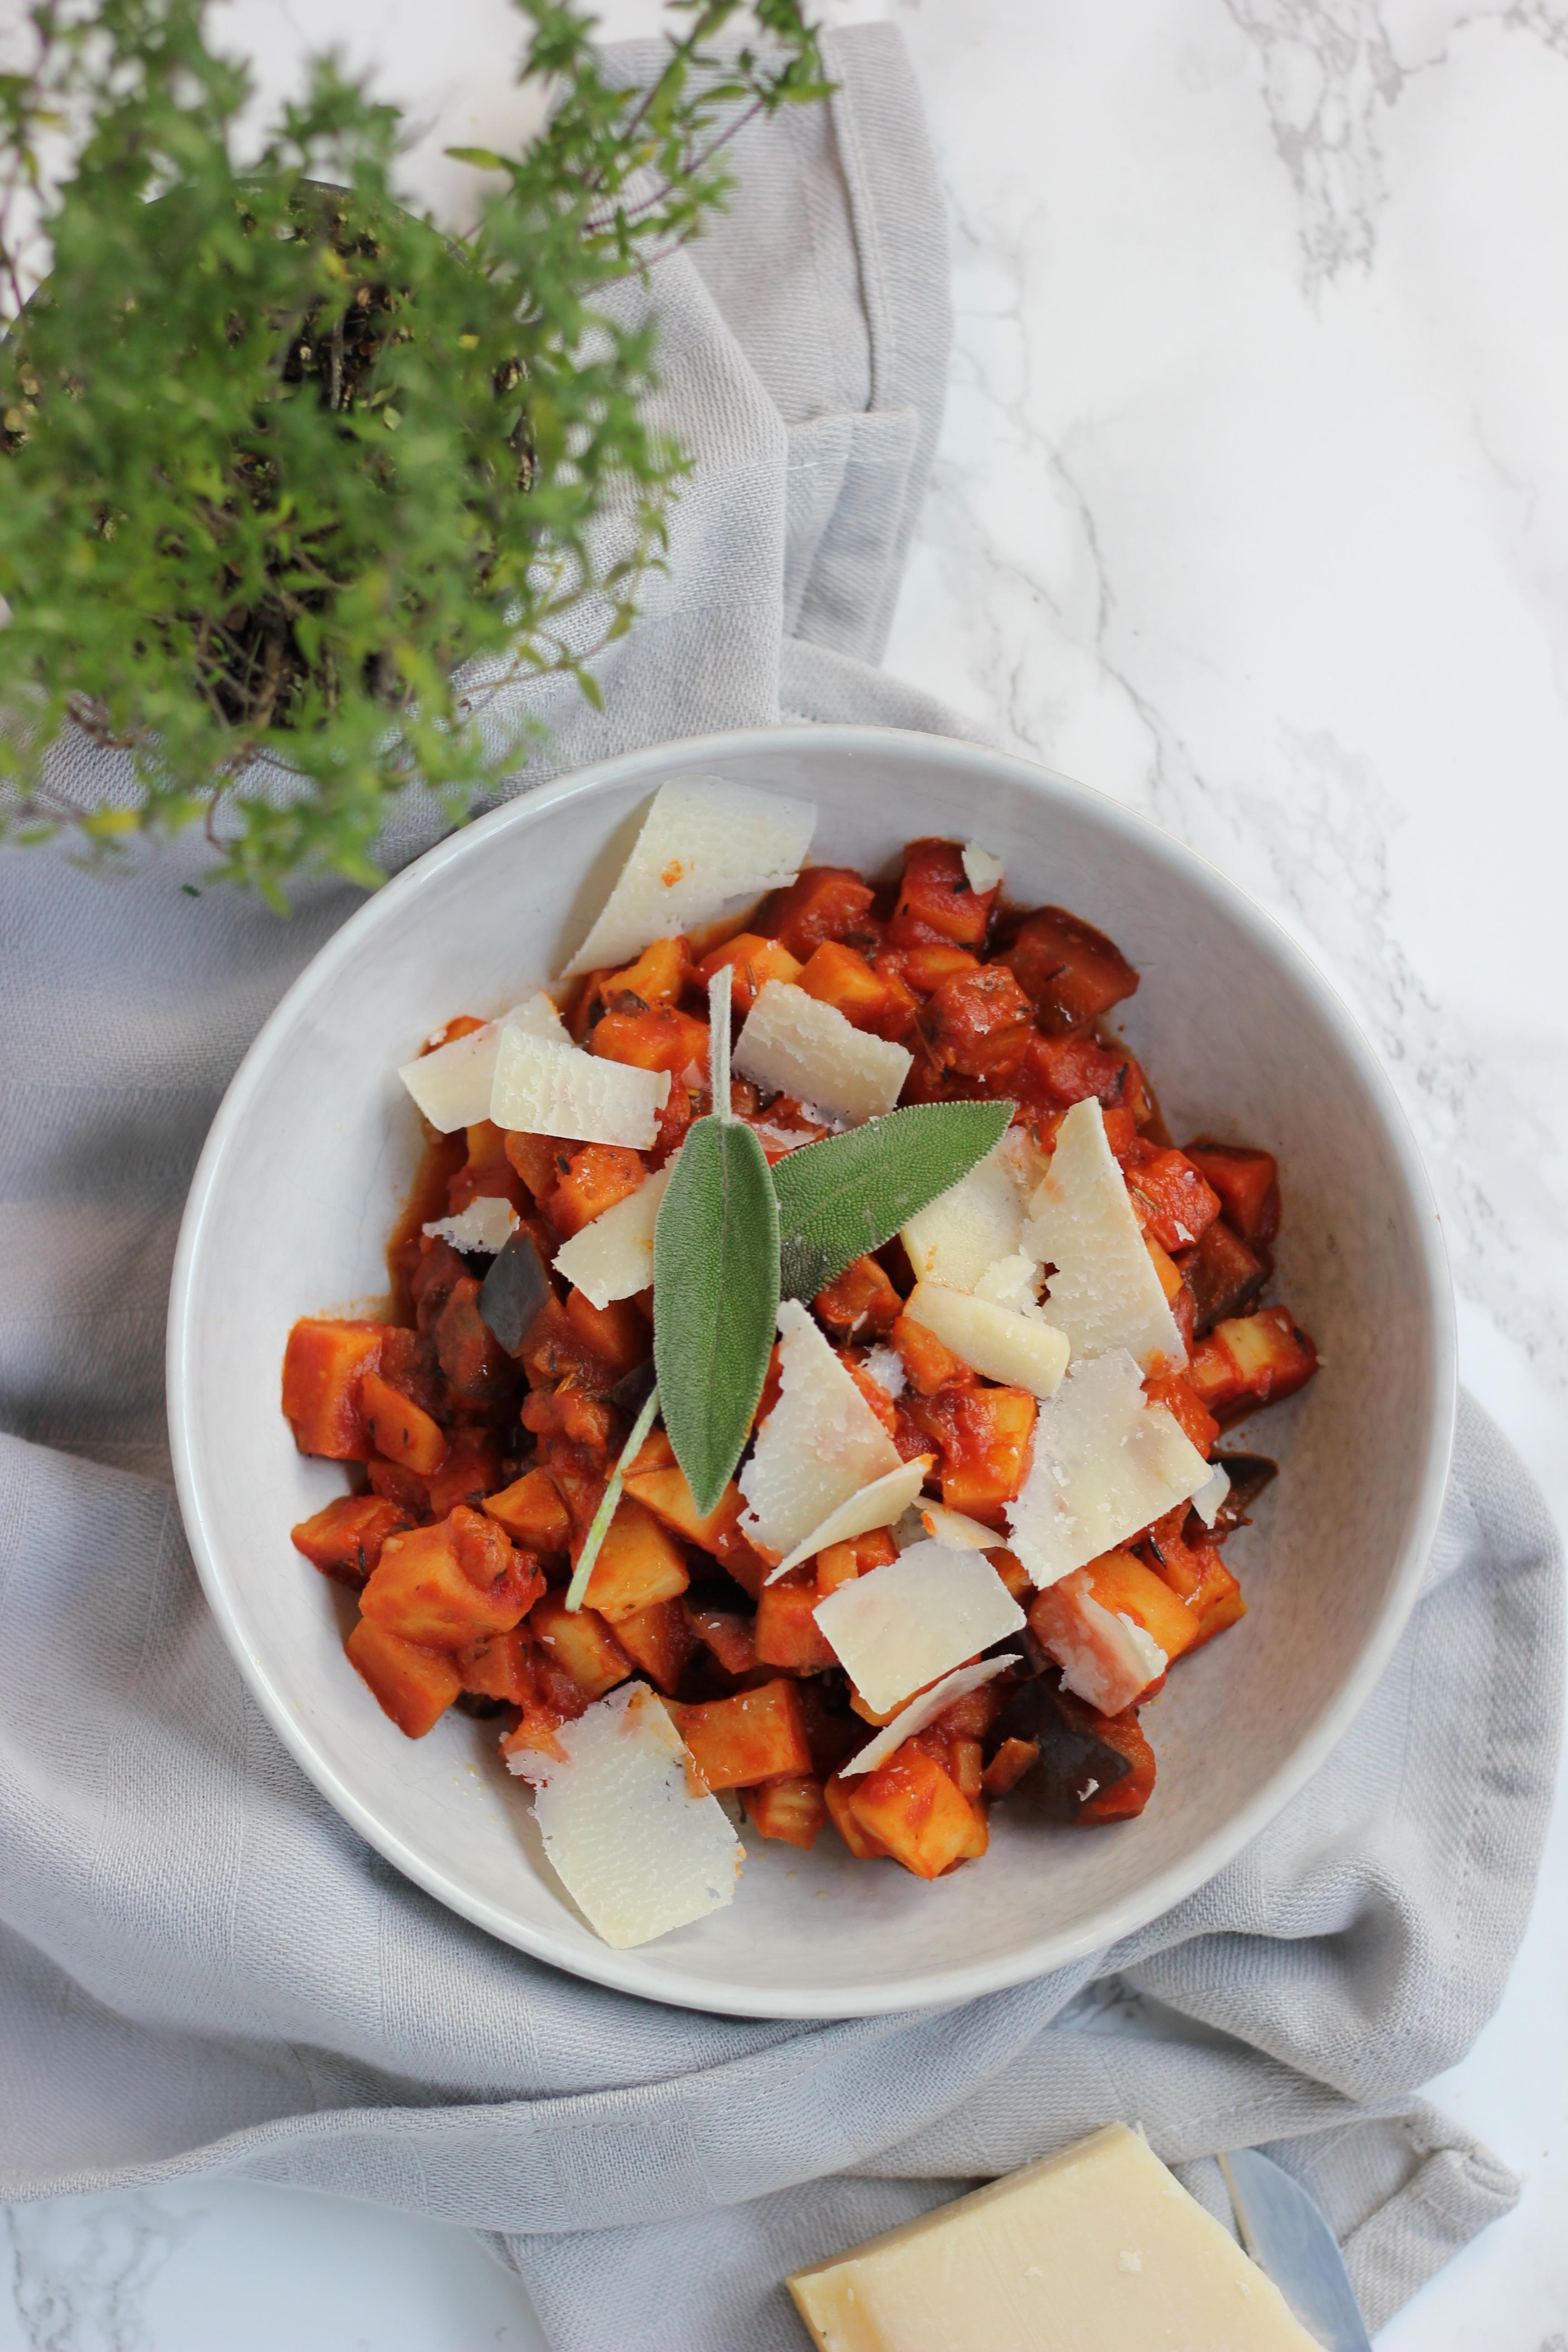 Italiaanse stoof met pastinaak en verse kruiden